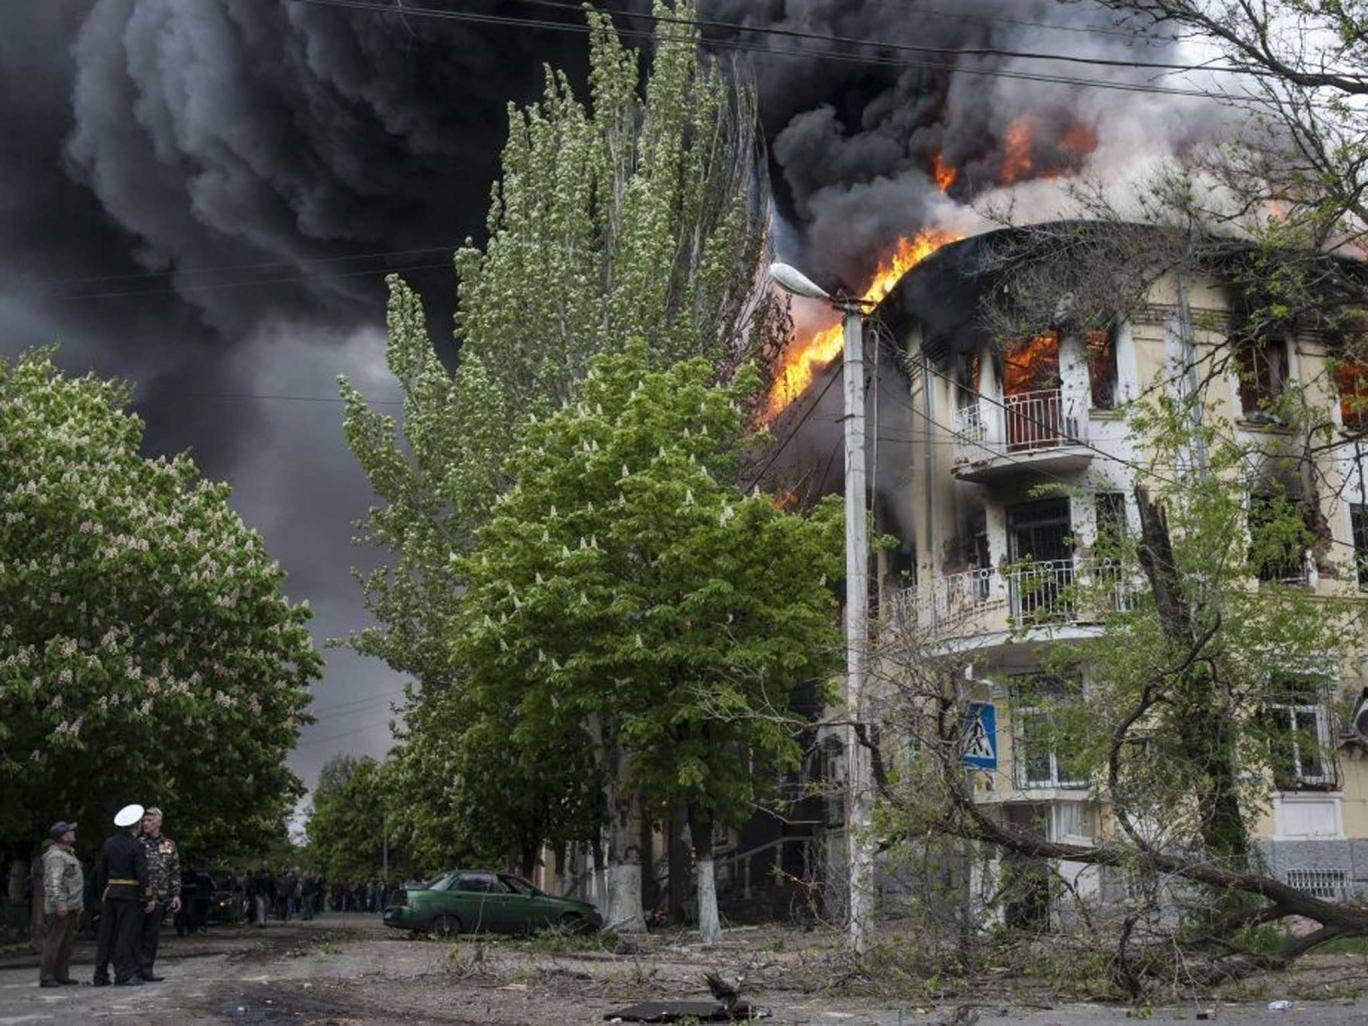 The city's police station ablaze